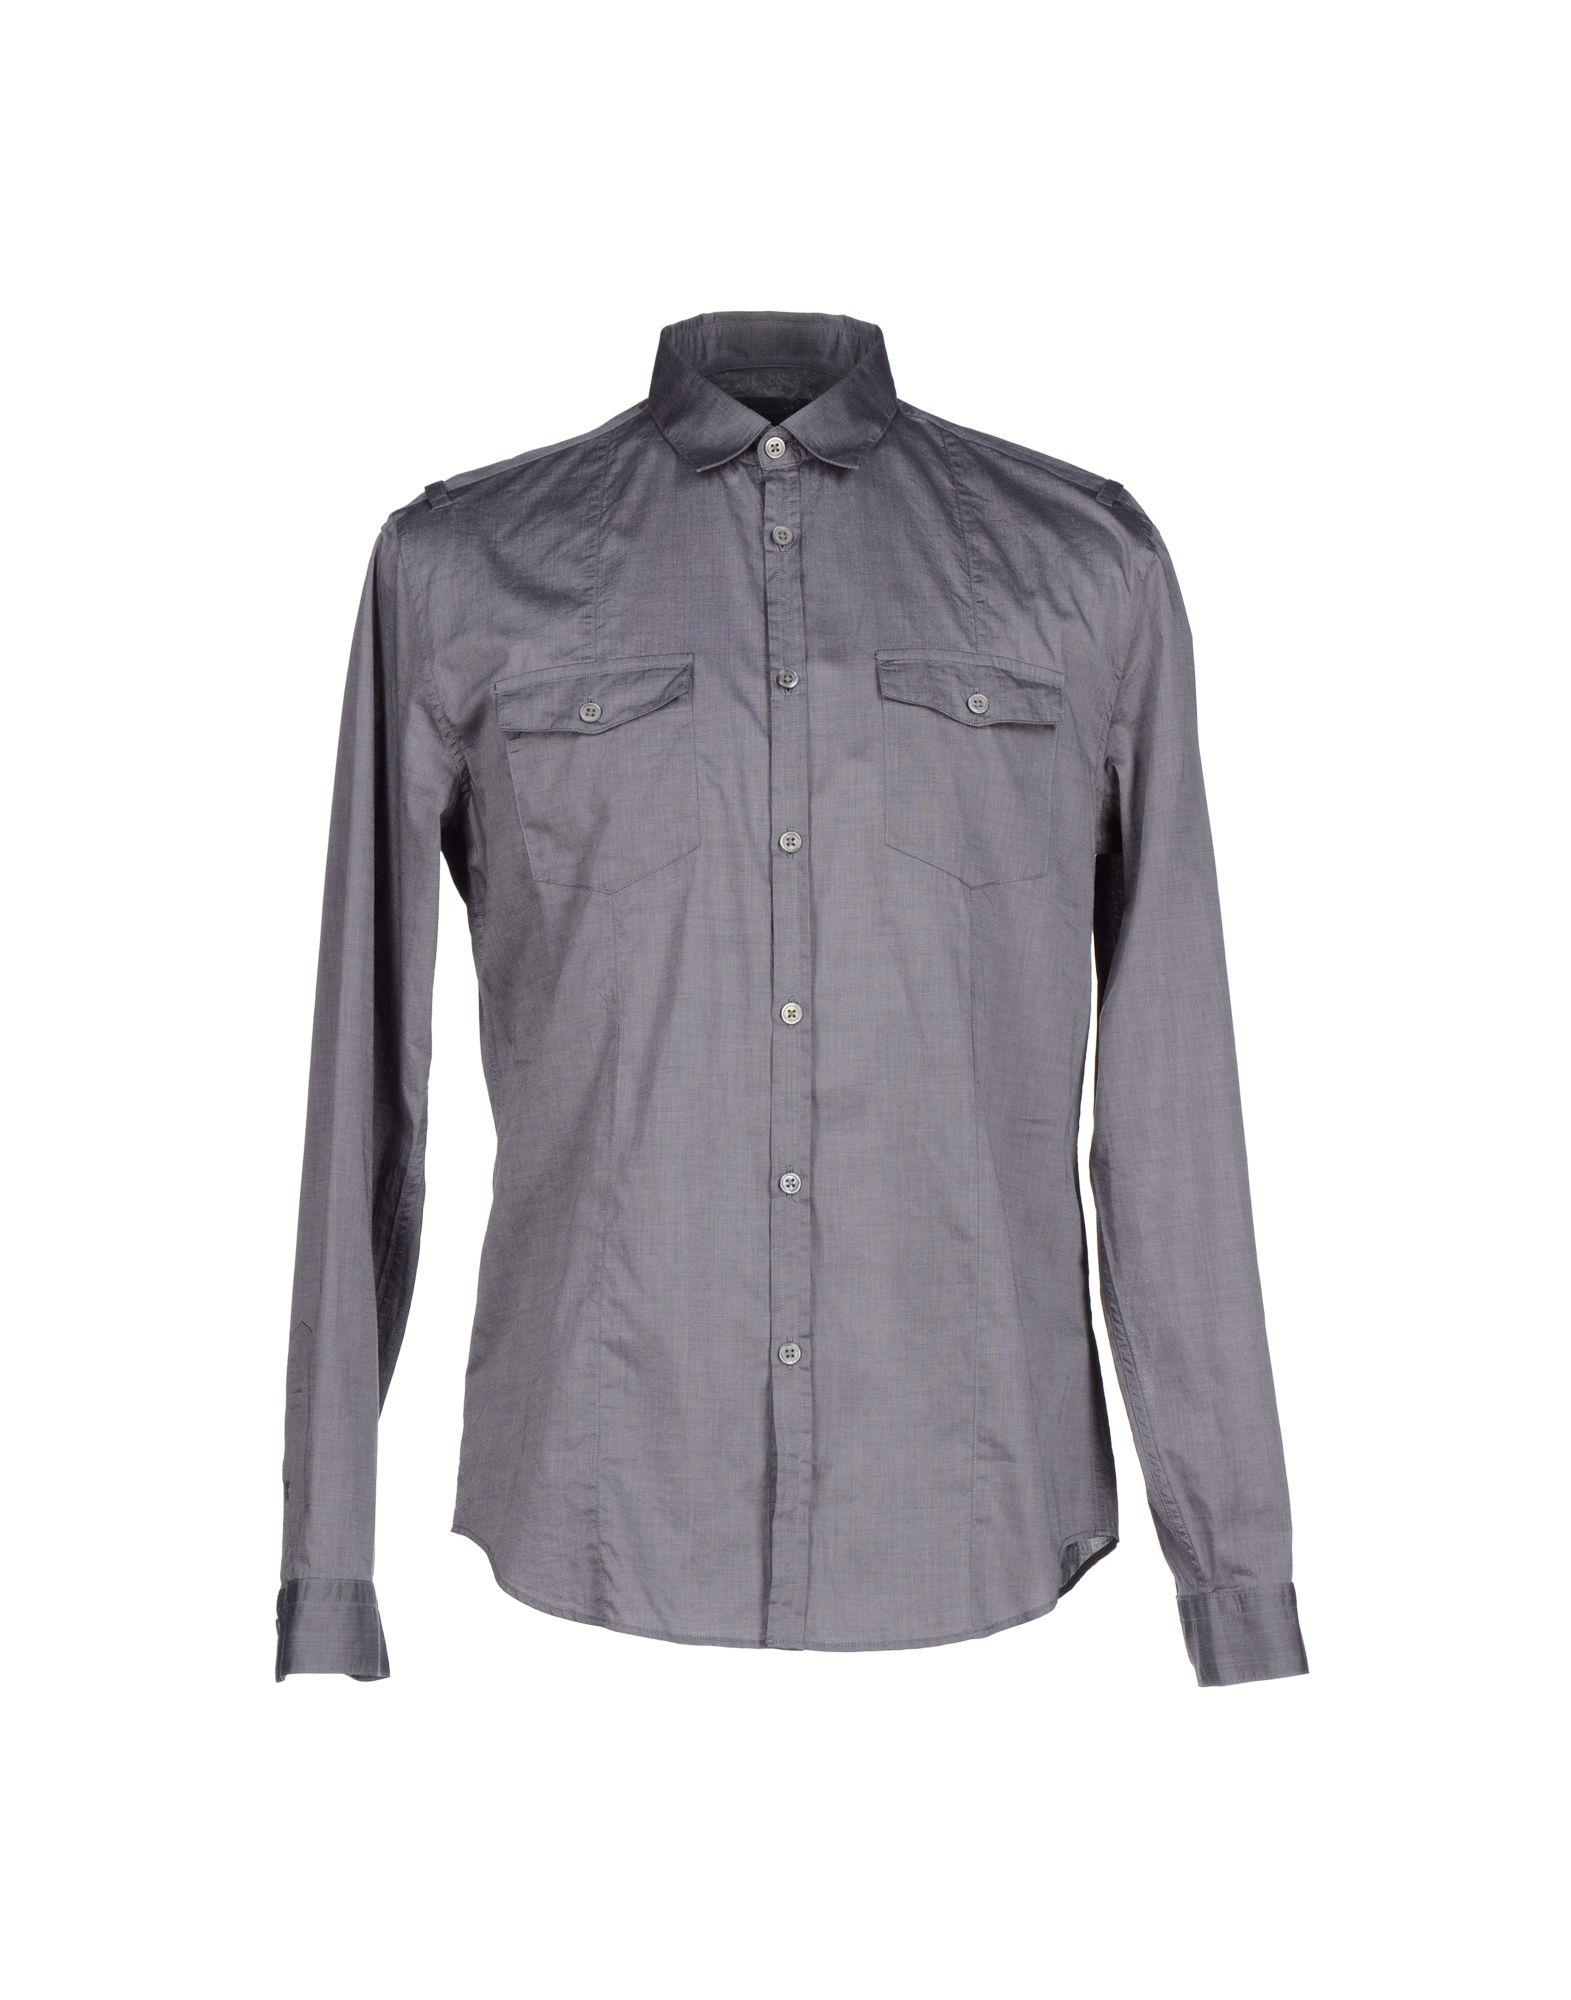 John varvatos Shirt in Gray for Men